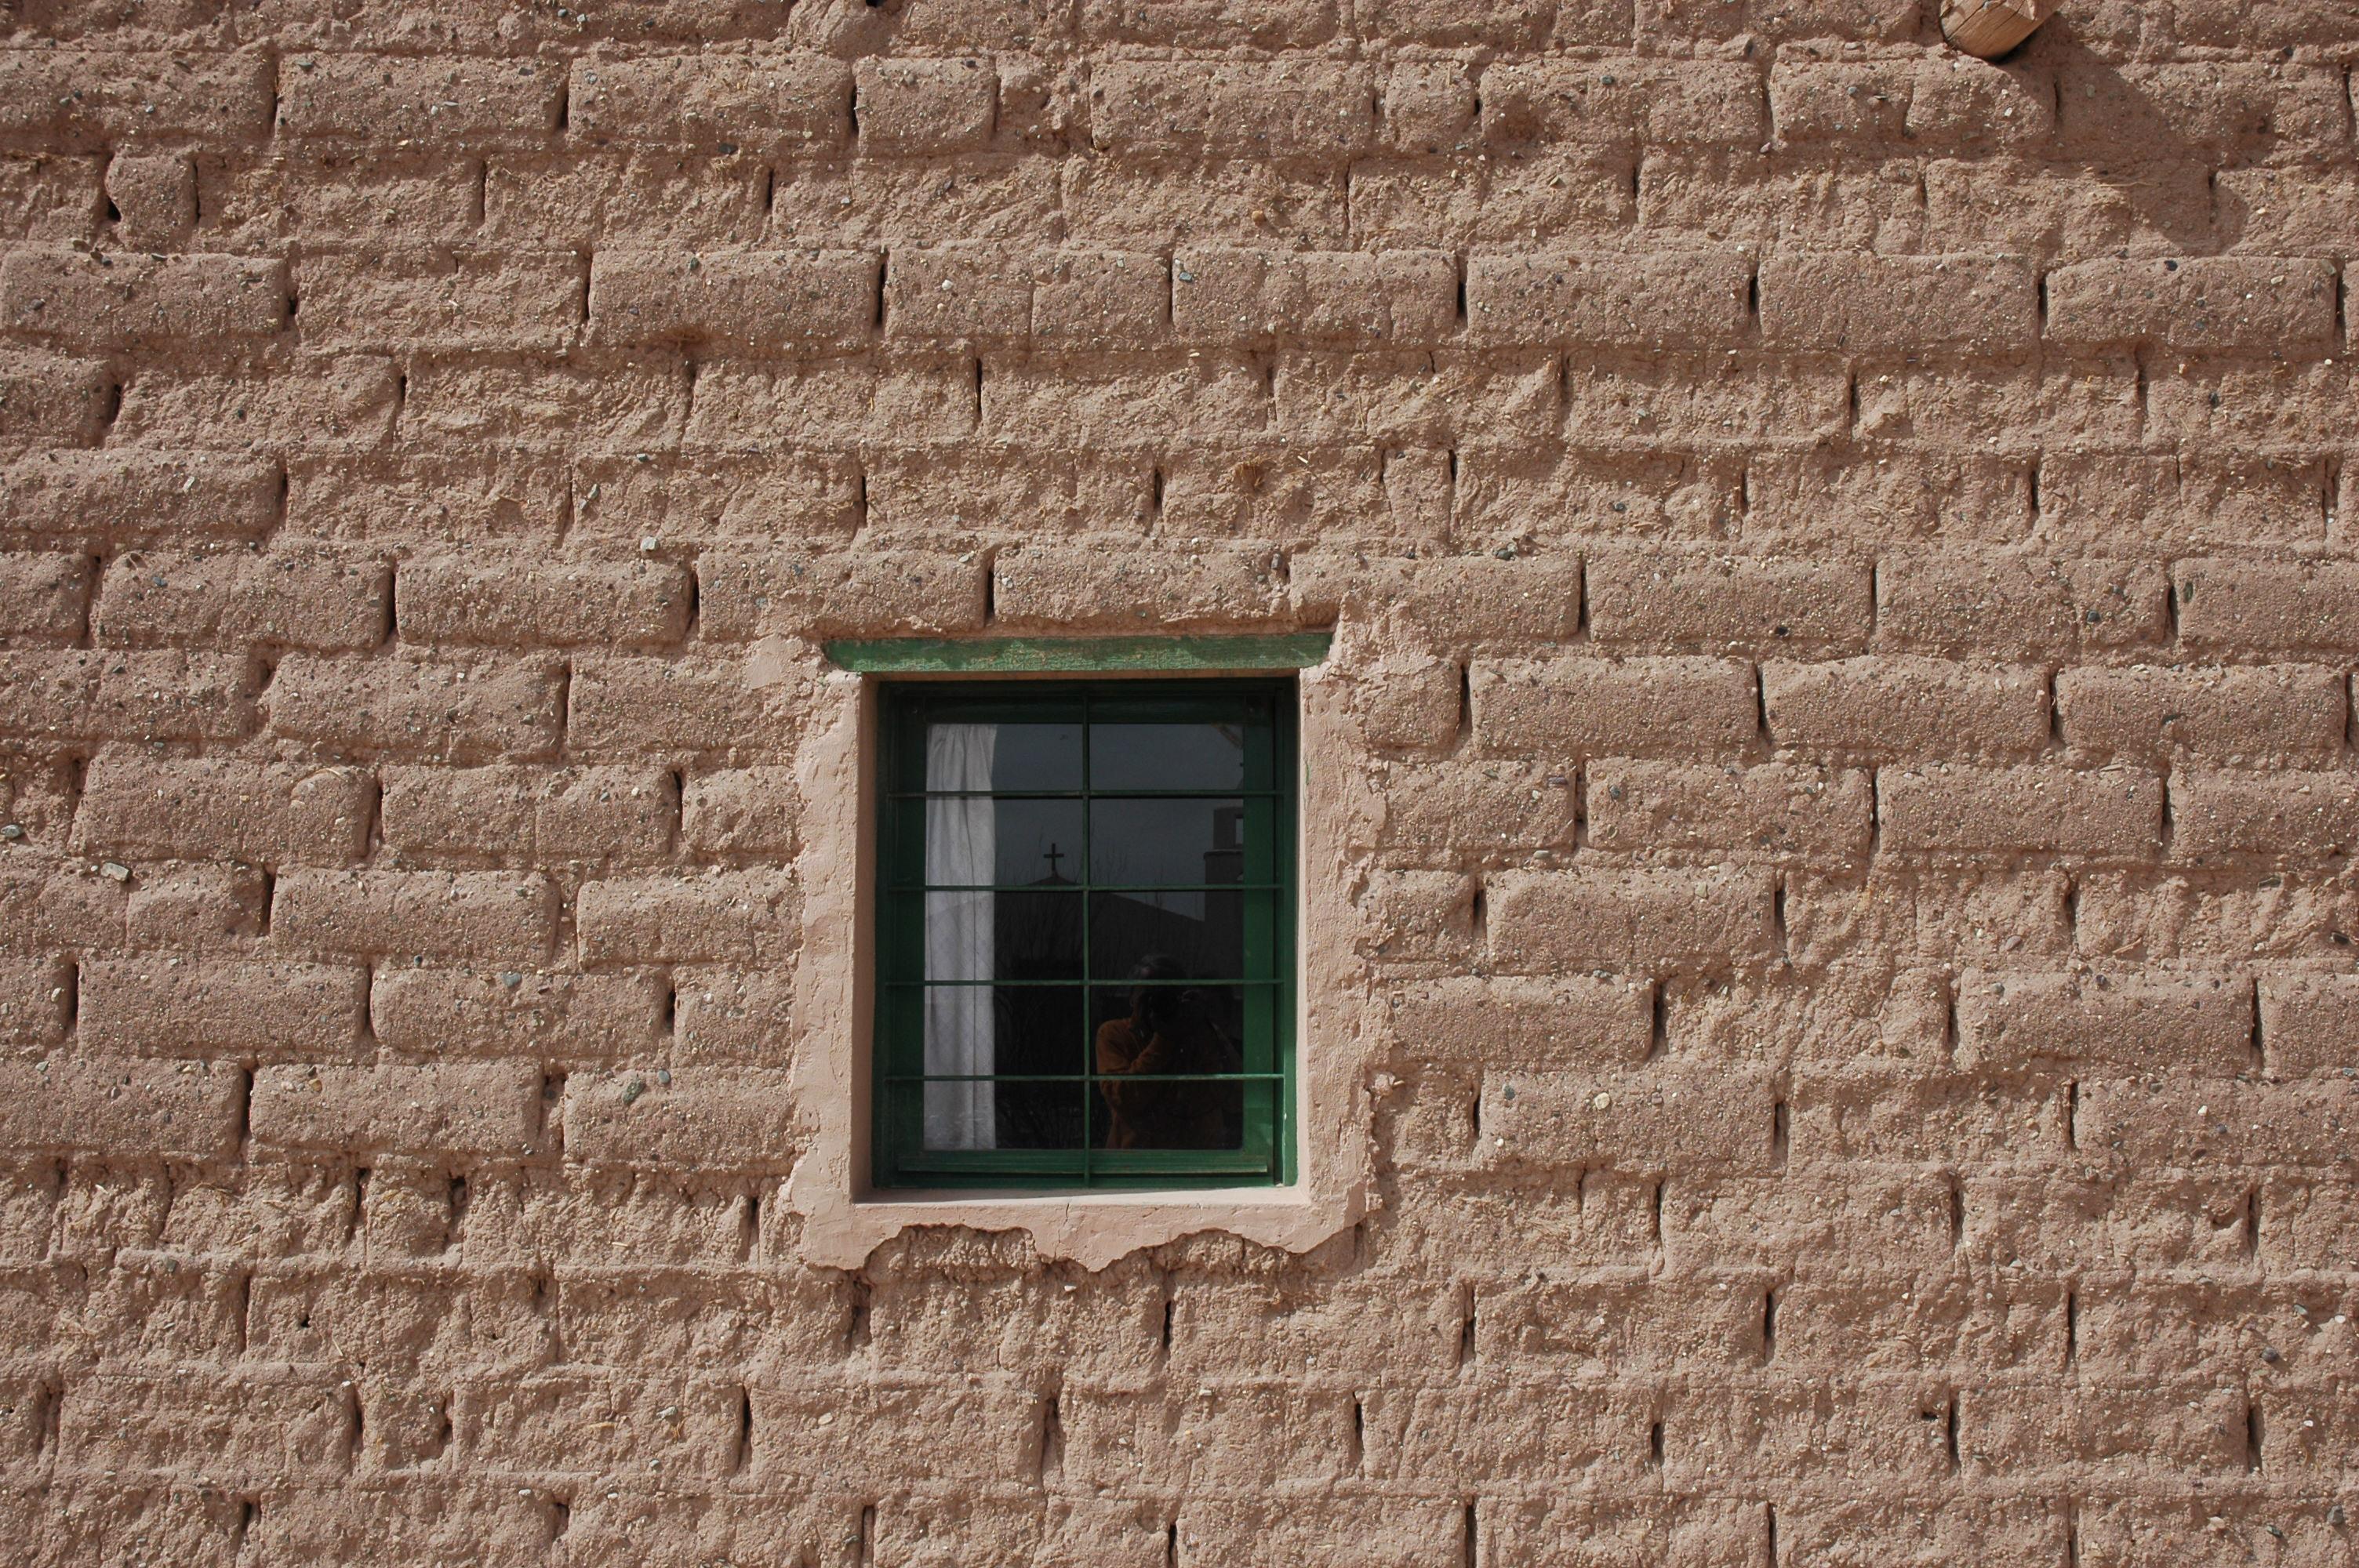 File:Muro in terra cruda sulla Puna andina tra Argentina e.